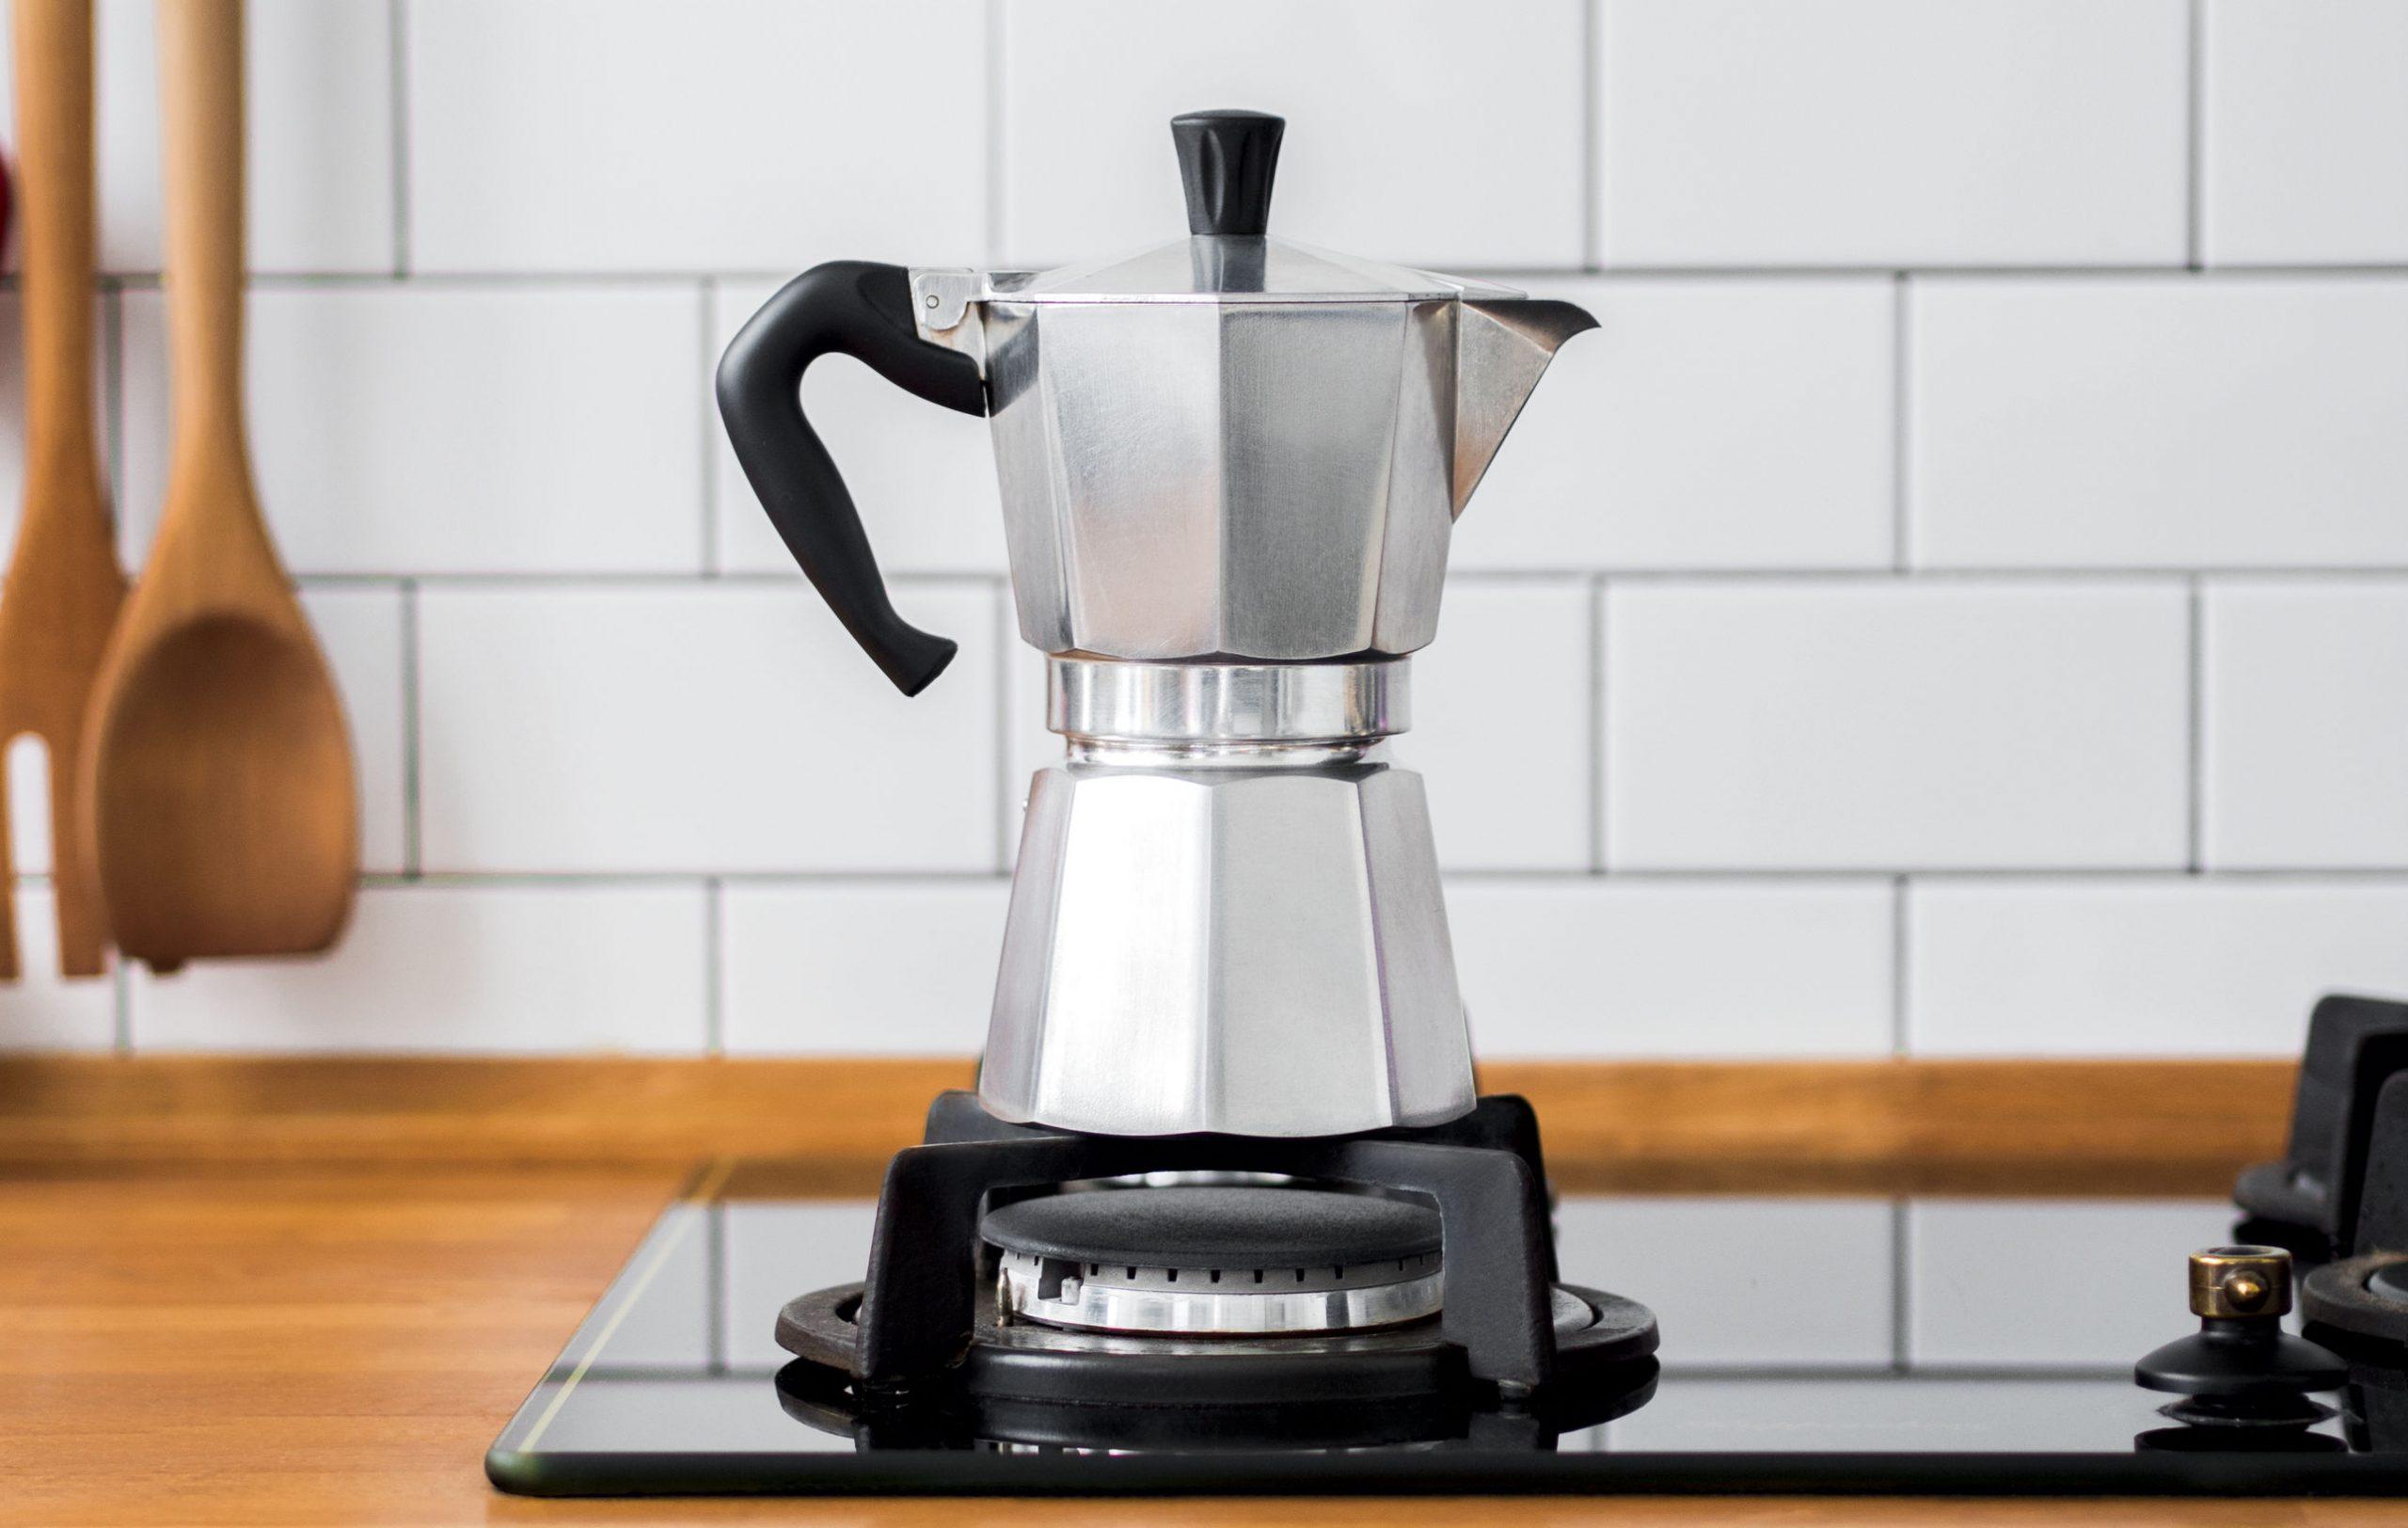 Espressokocher Induktion